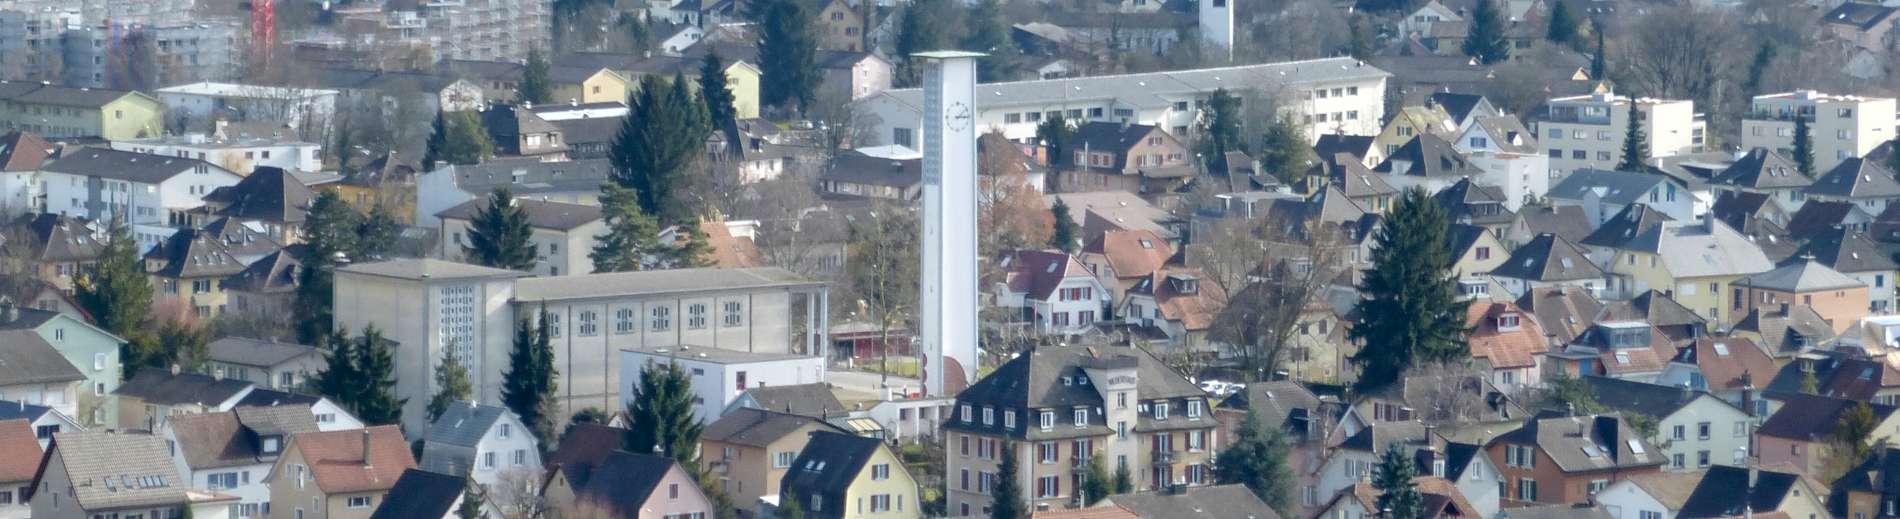 Kirchgemeinde Wettingen